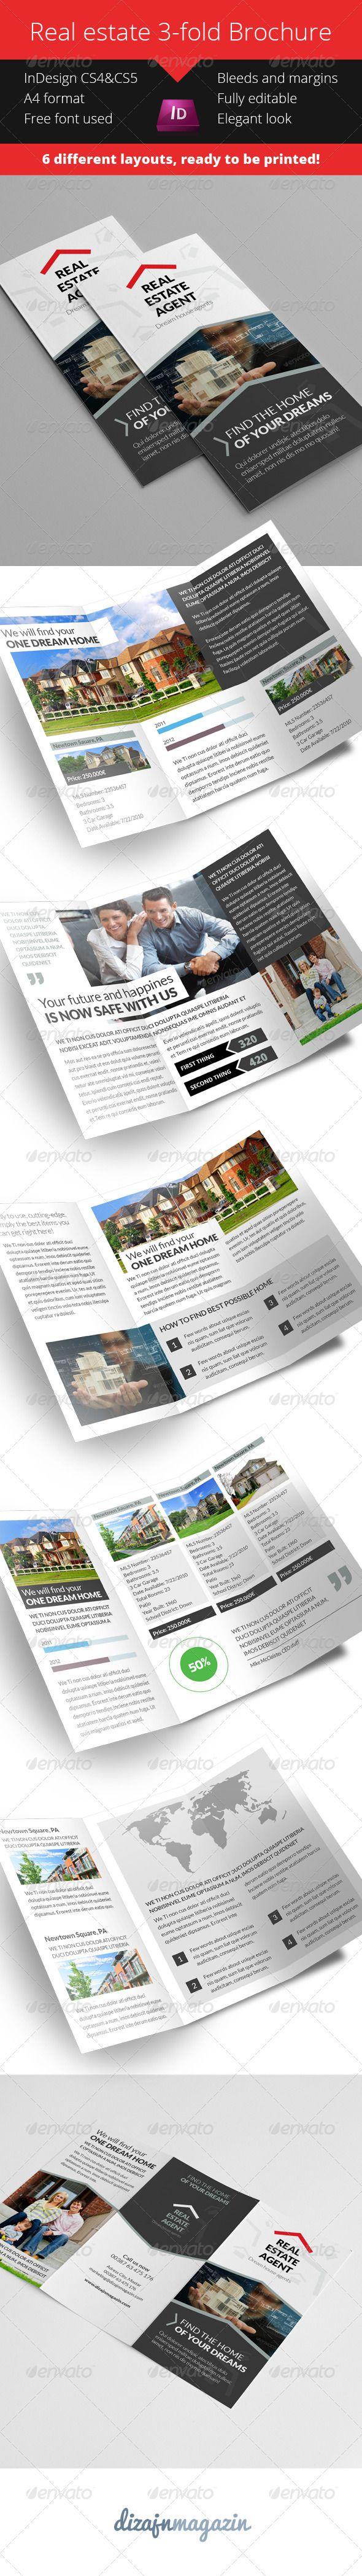 3 fold brochure template indesign - real estate 3 fold brochure product catalog fonts